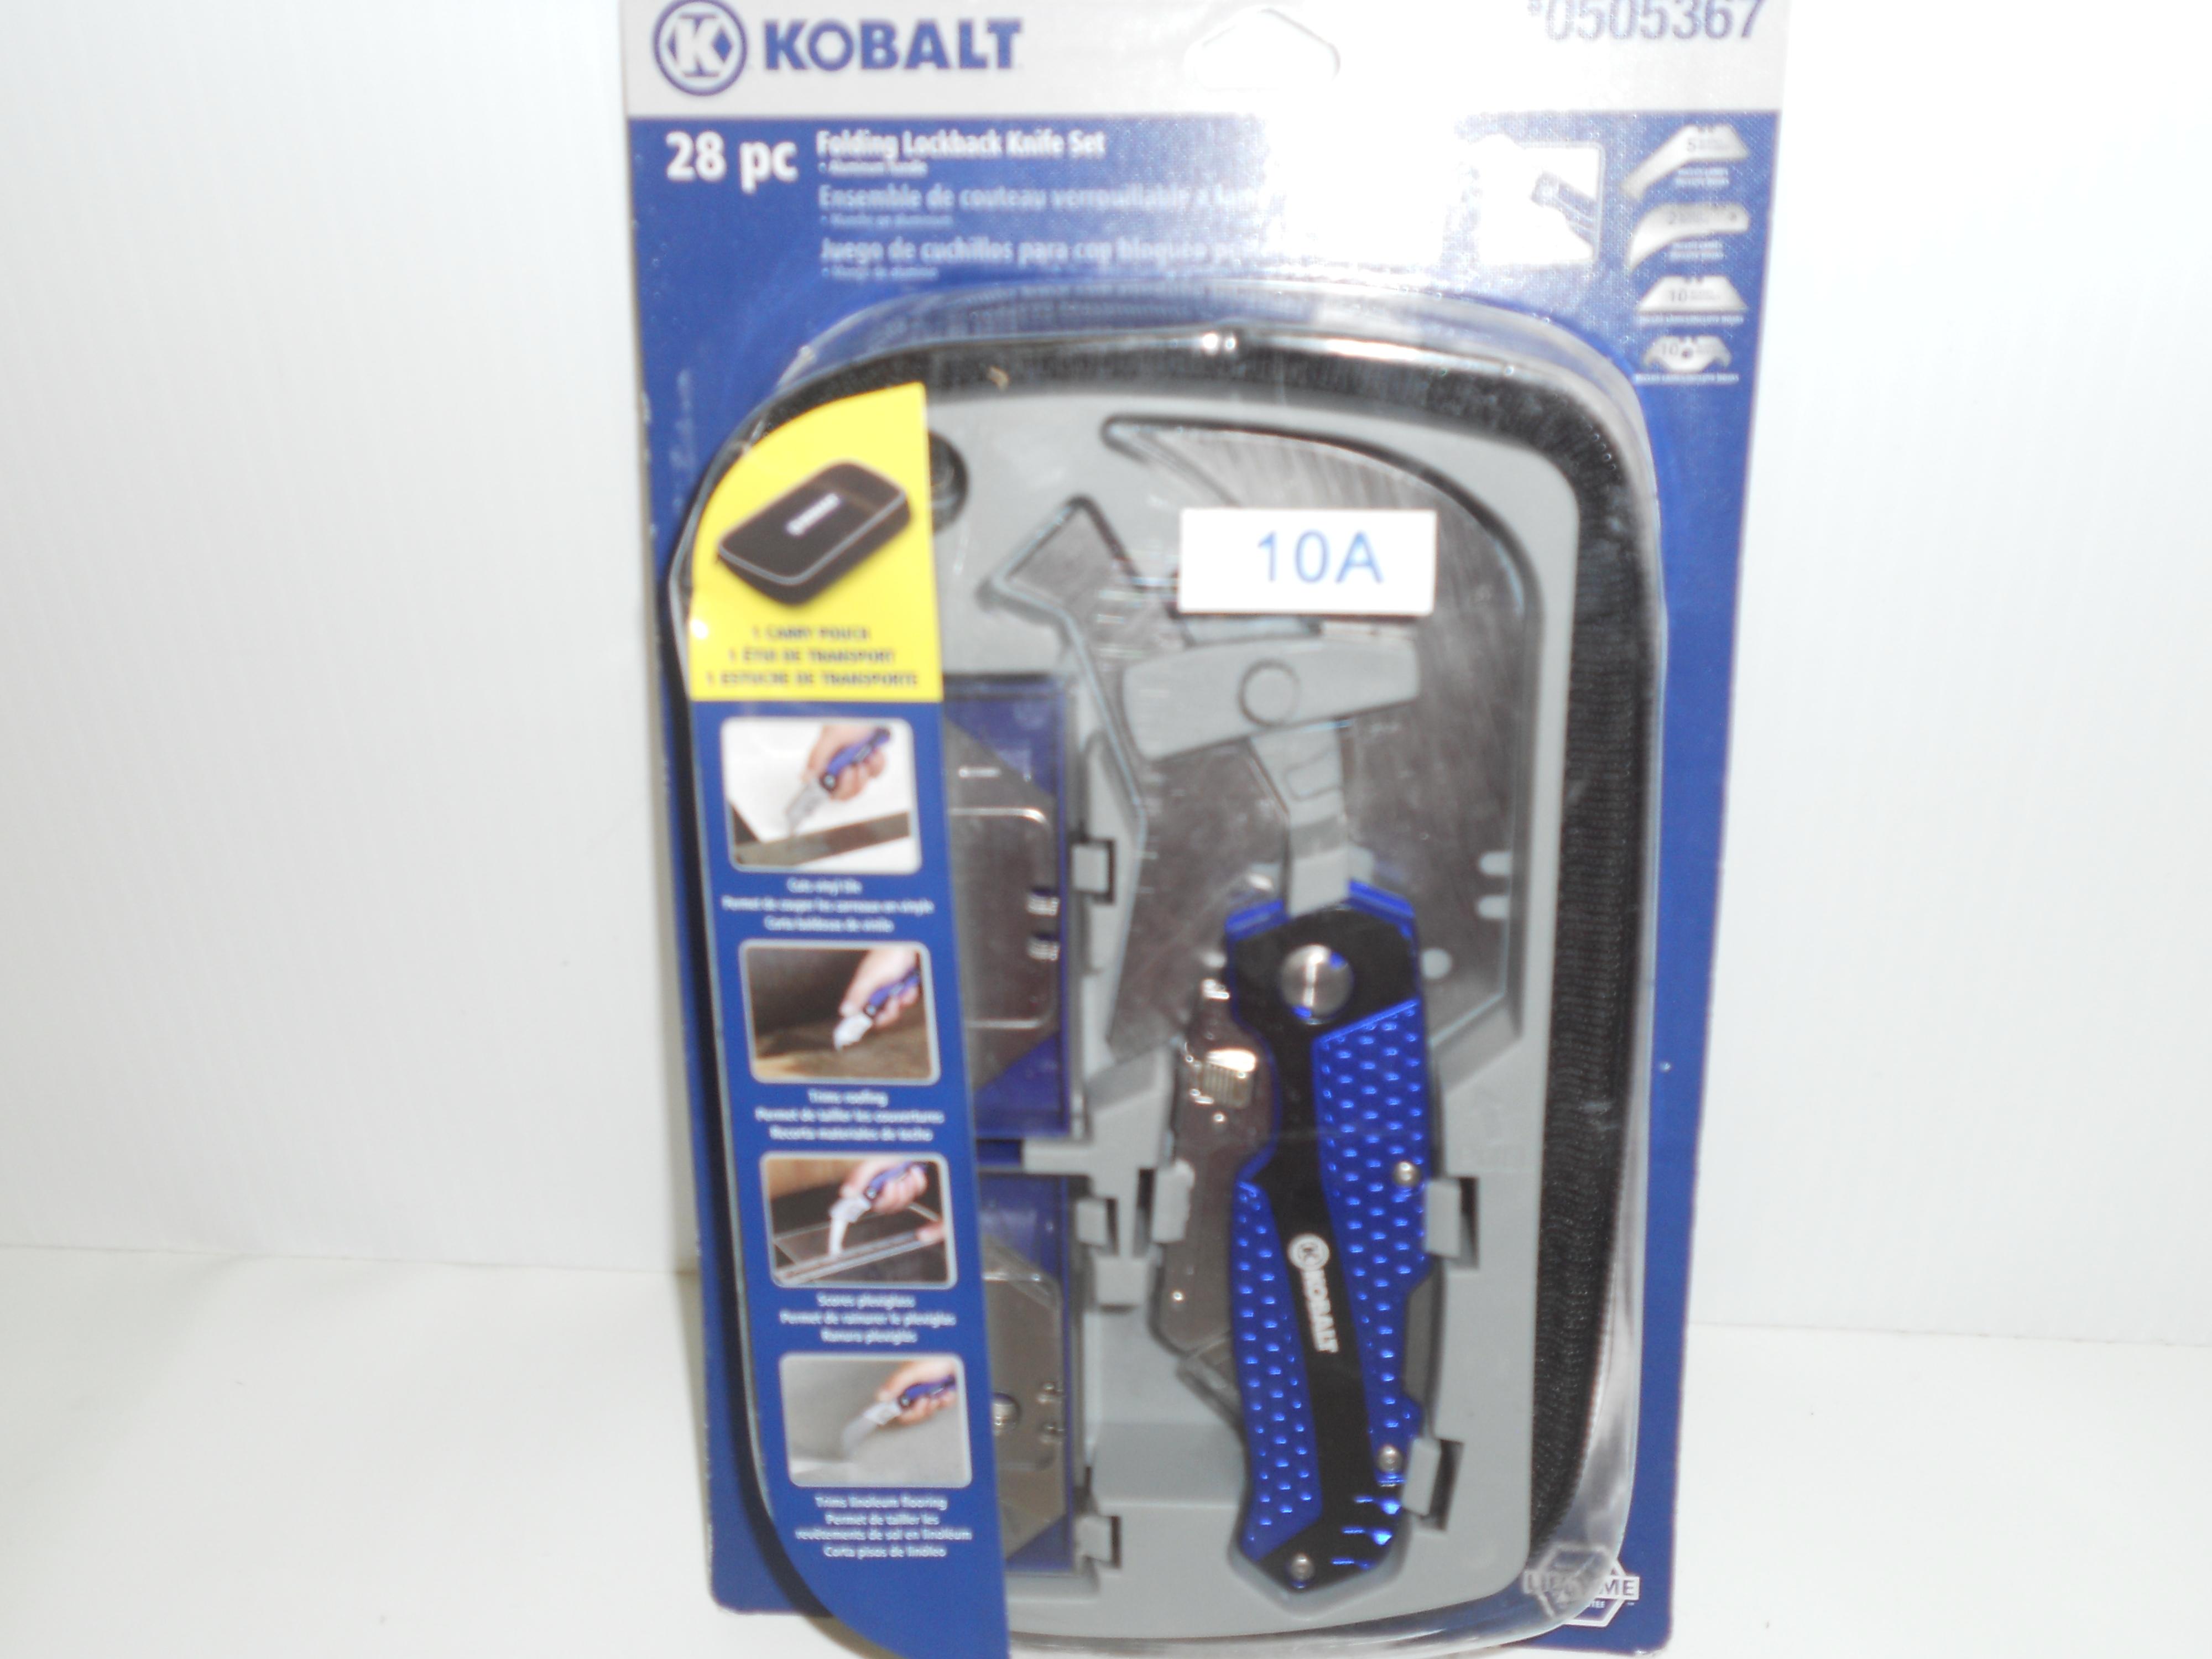 Kobalt 28- piece Folding lockback knife set